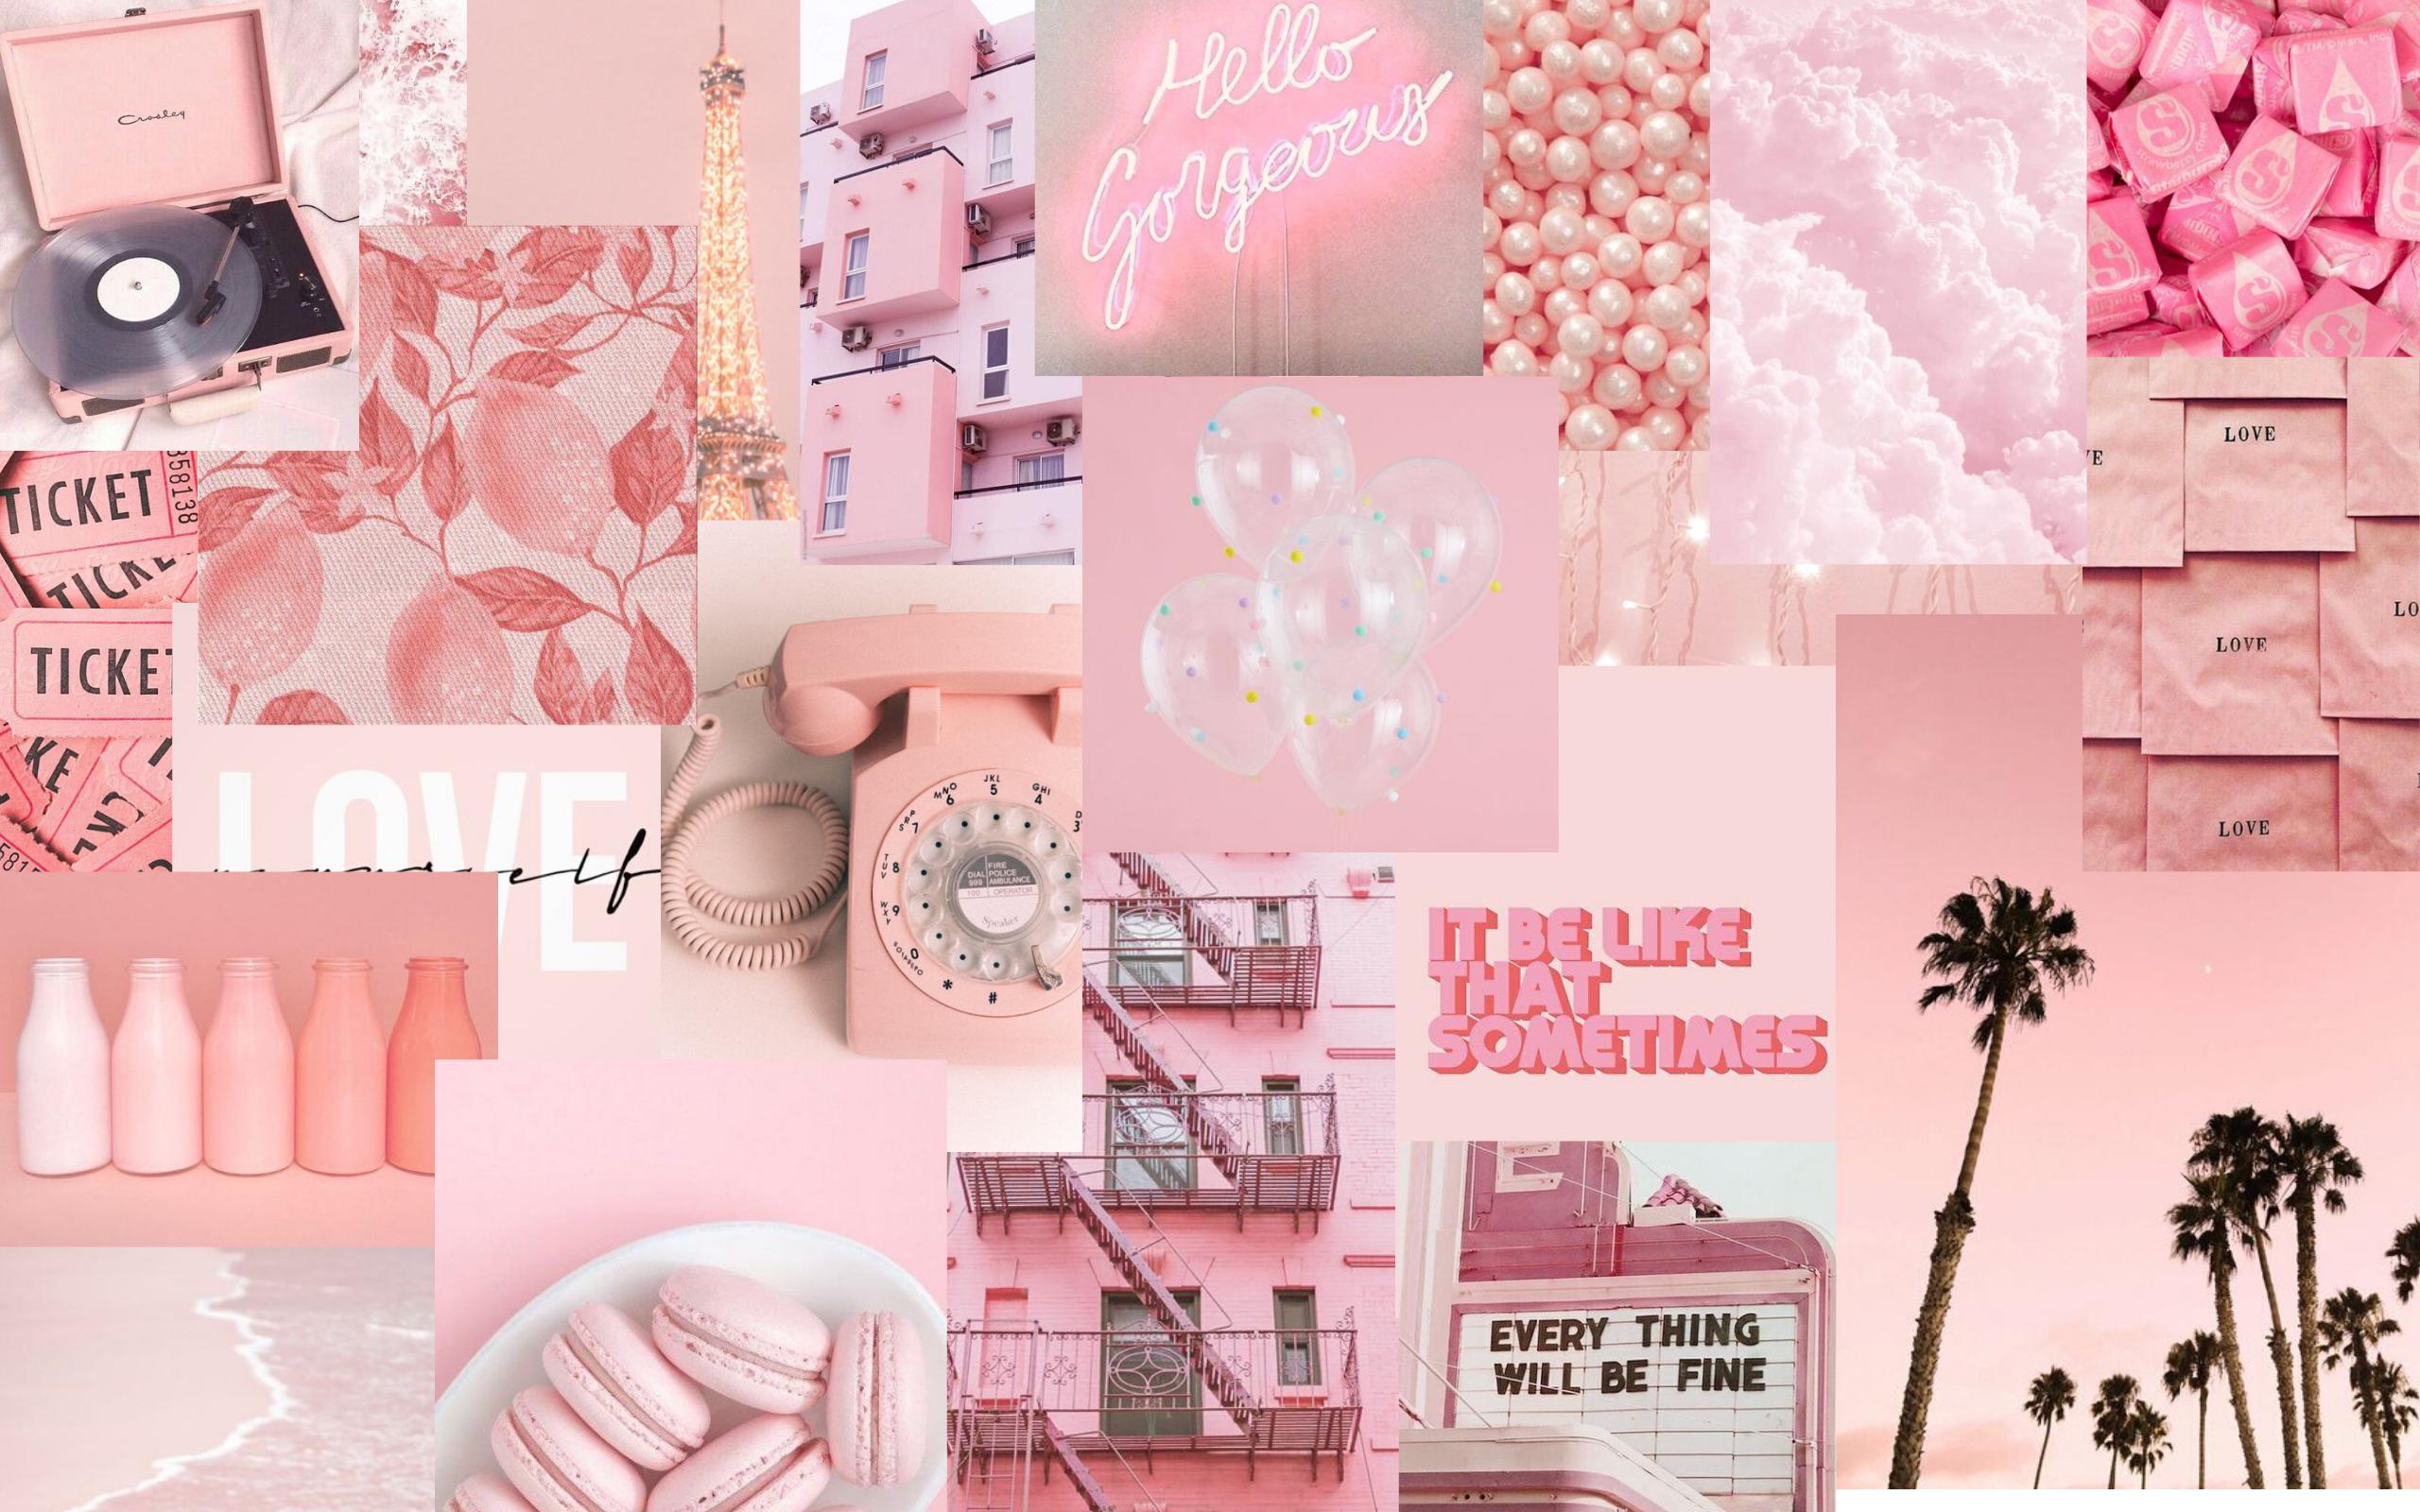 Light Pink Cute Desktop Wallpaper Aesthetic Desktop Wallpaper Macbook Wallpaper